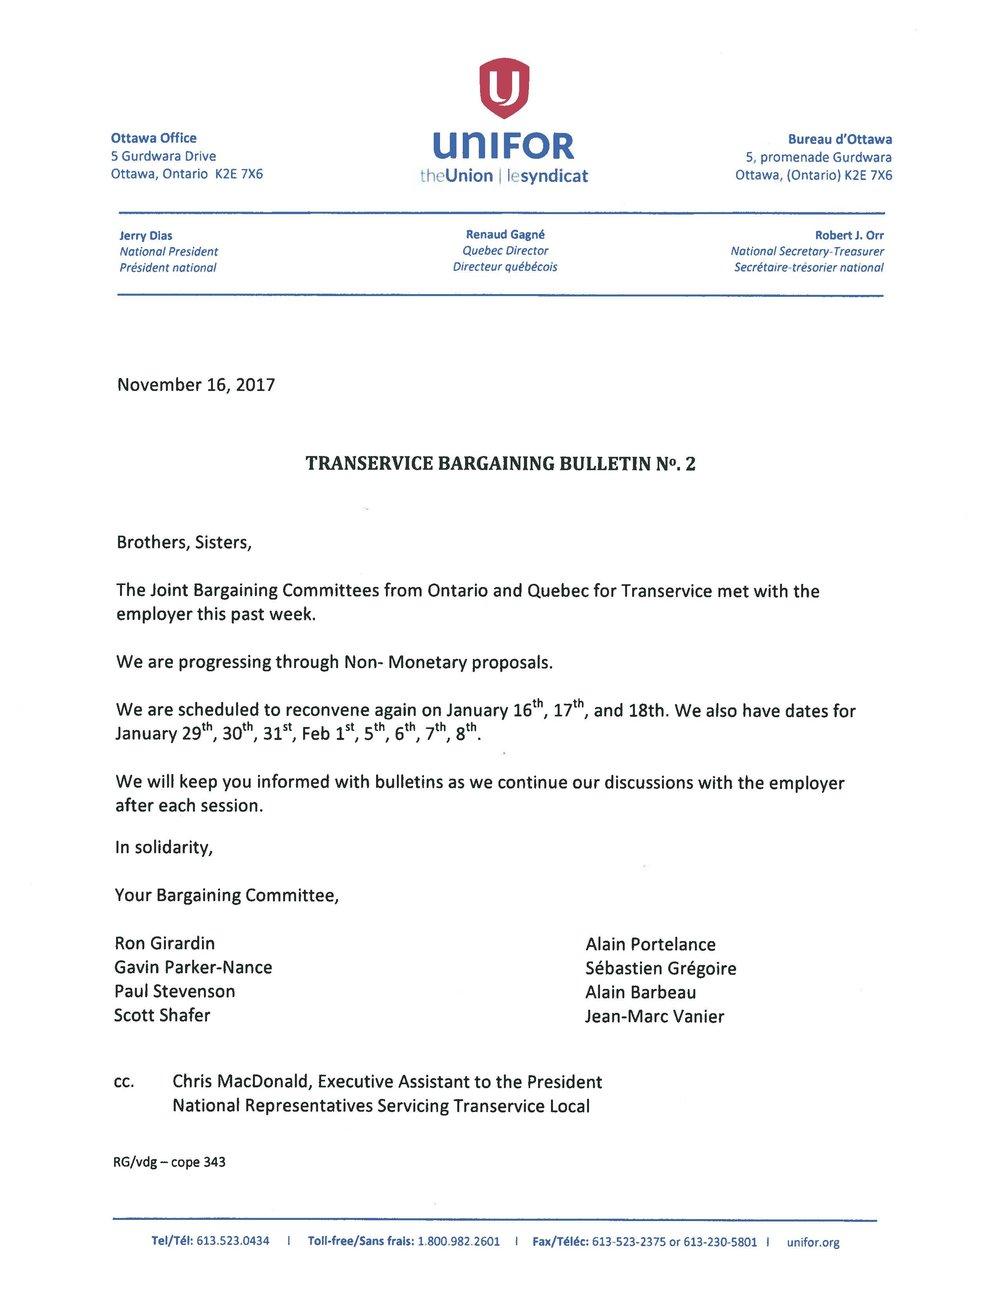 Transervice Bargaining - Bulletin - 02 - 2017-11-16.jpg